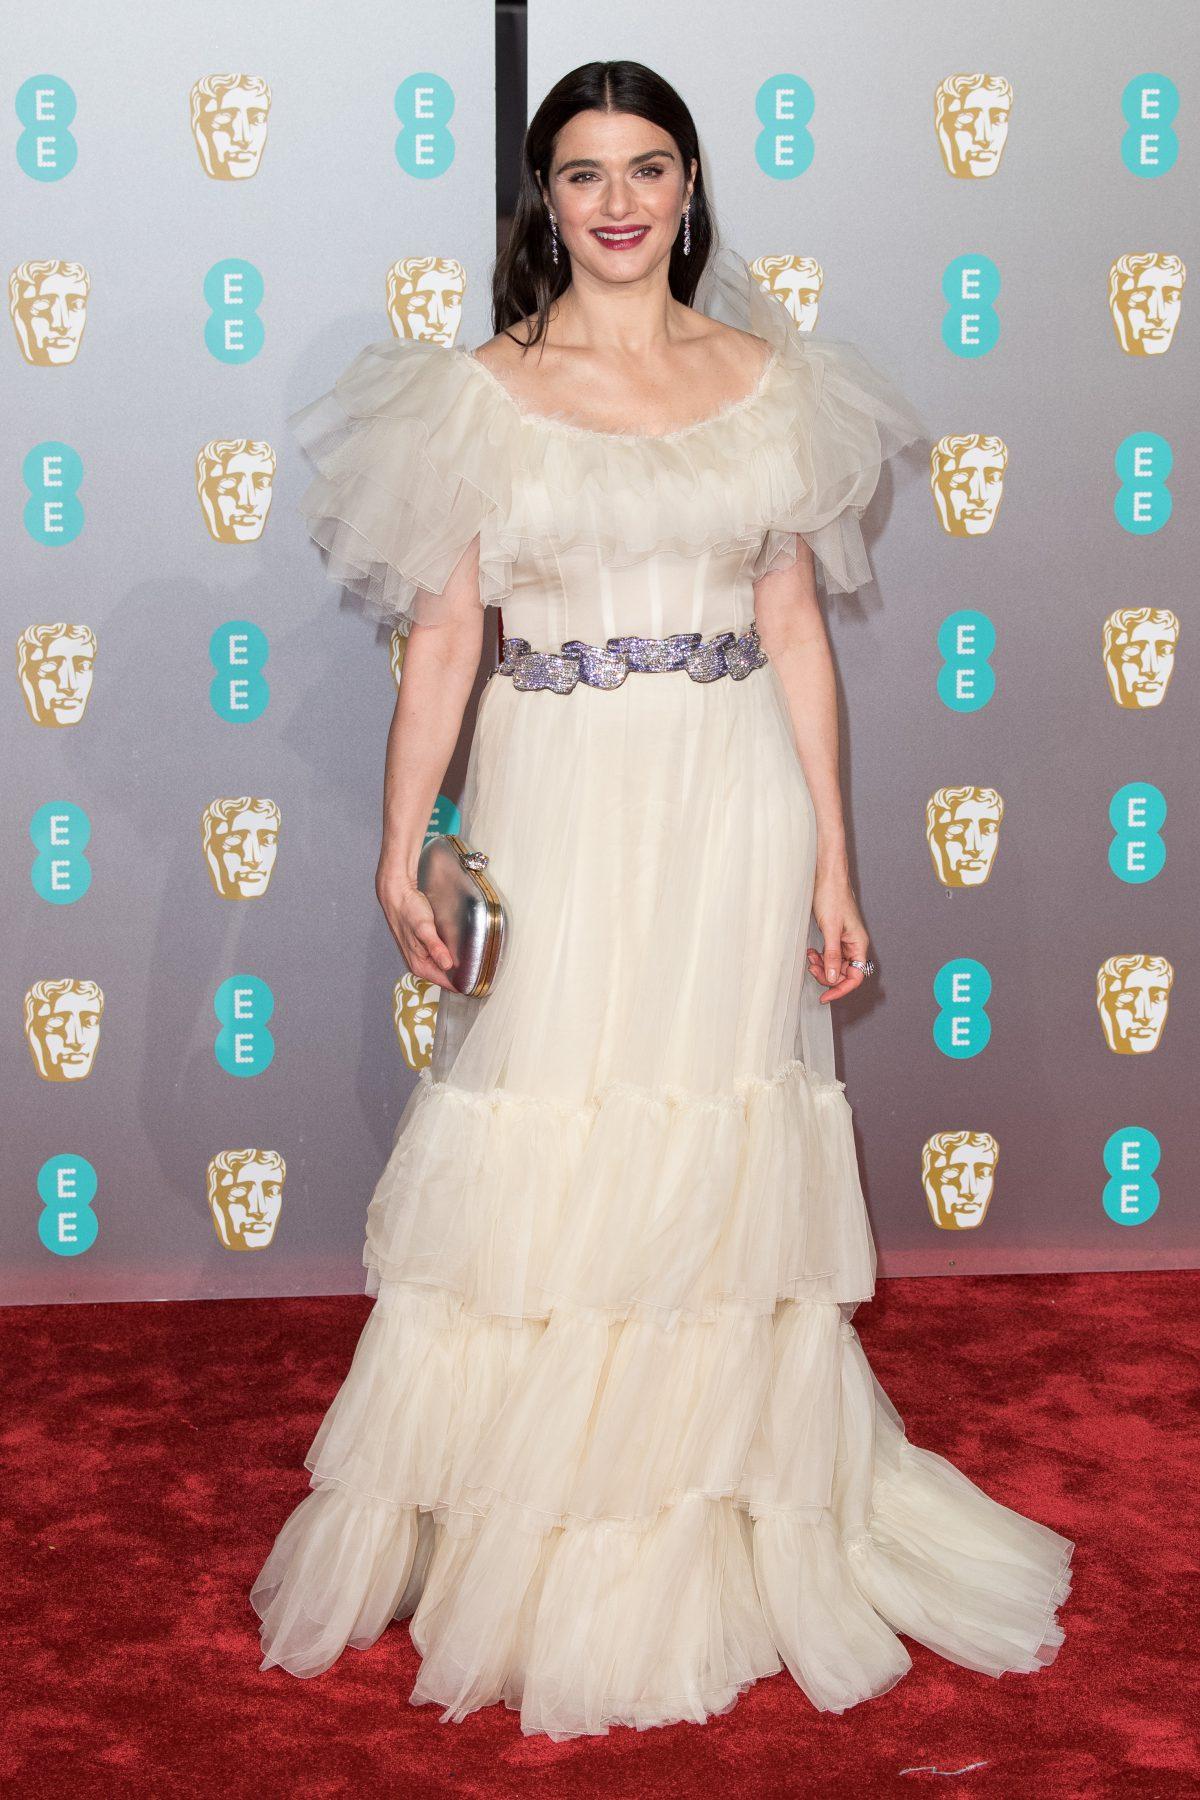 Rachel Weisz poses at the BAFTA awards 2019